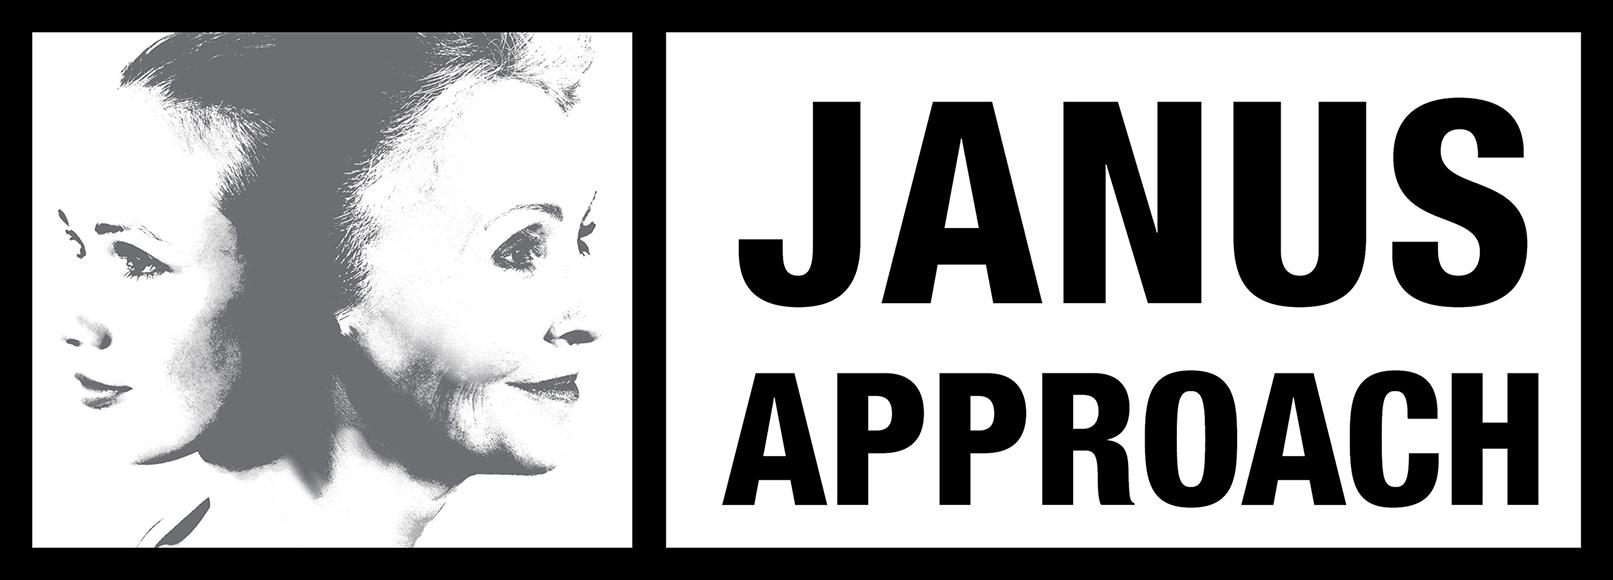 The Janus Approach